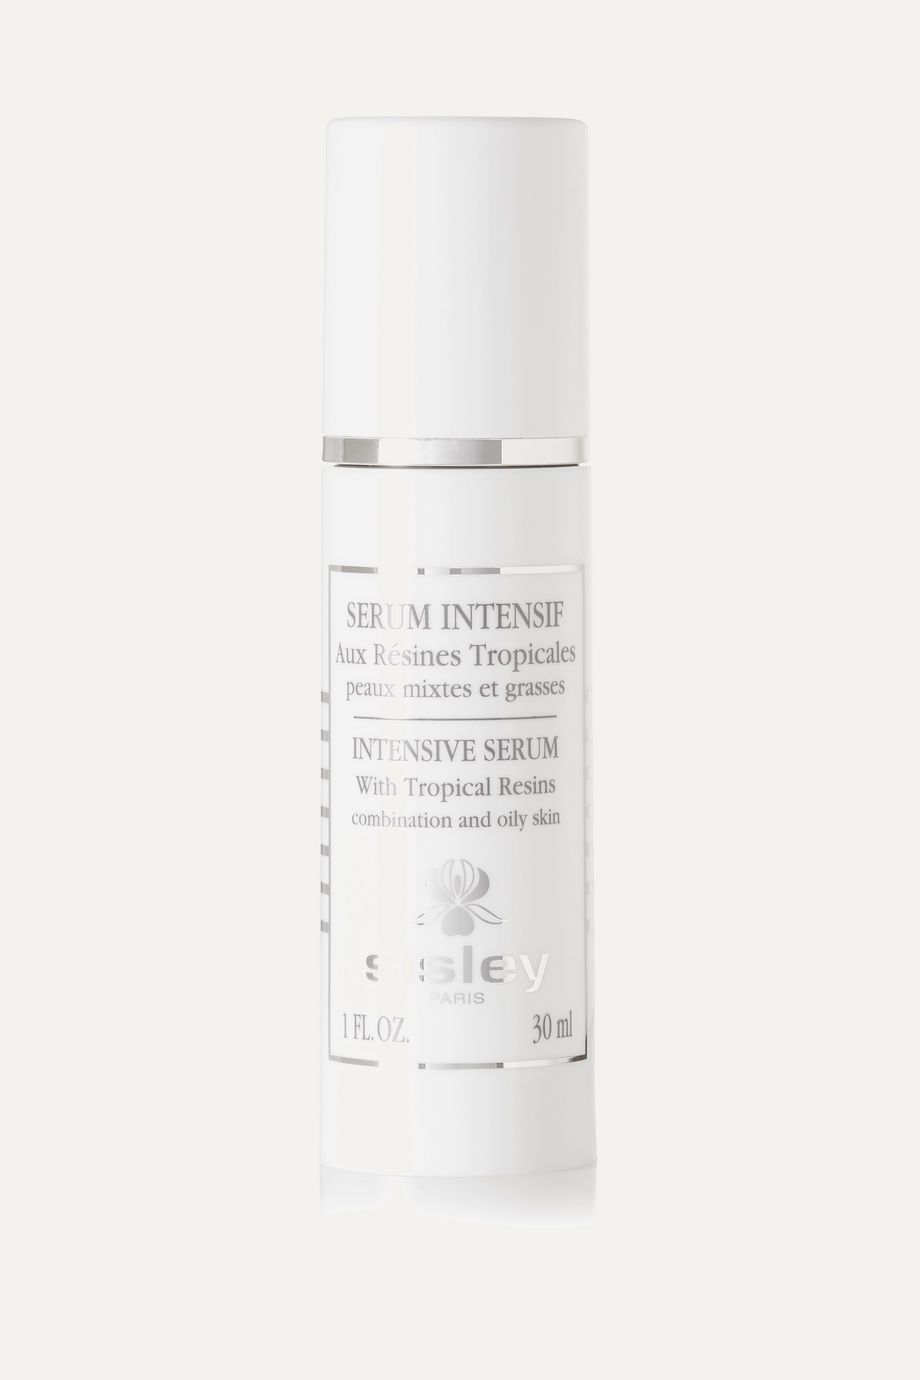 Sisley Intensive Serum with Tropical Resins, 30ml